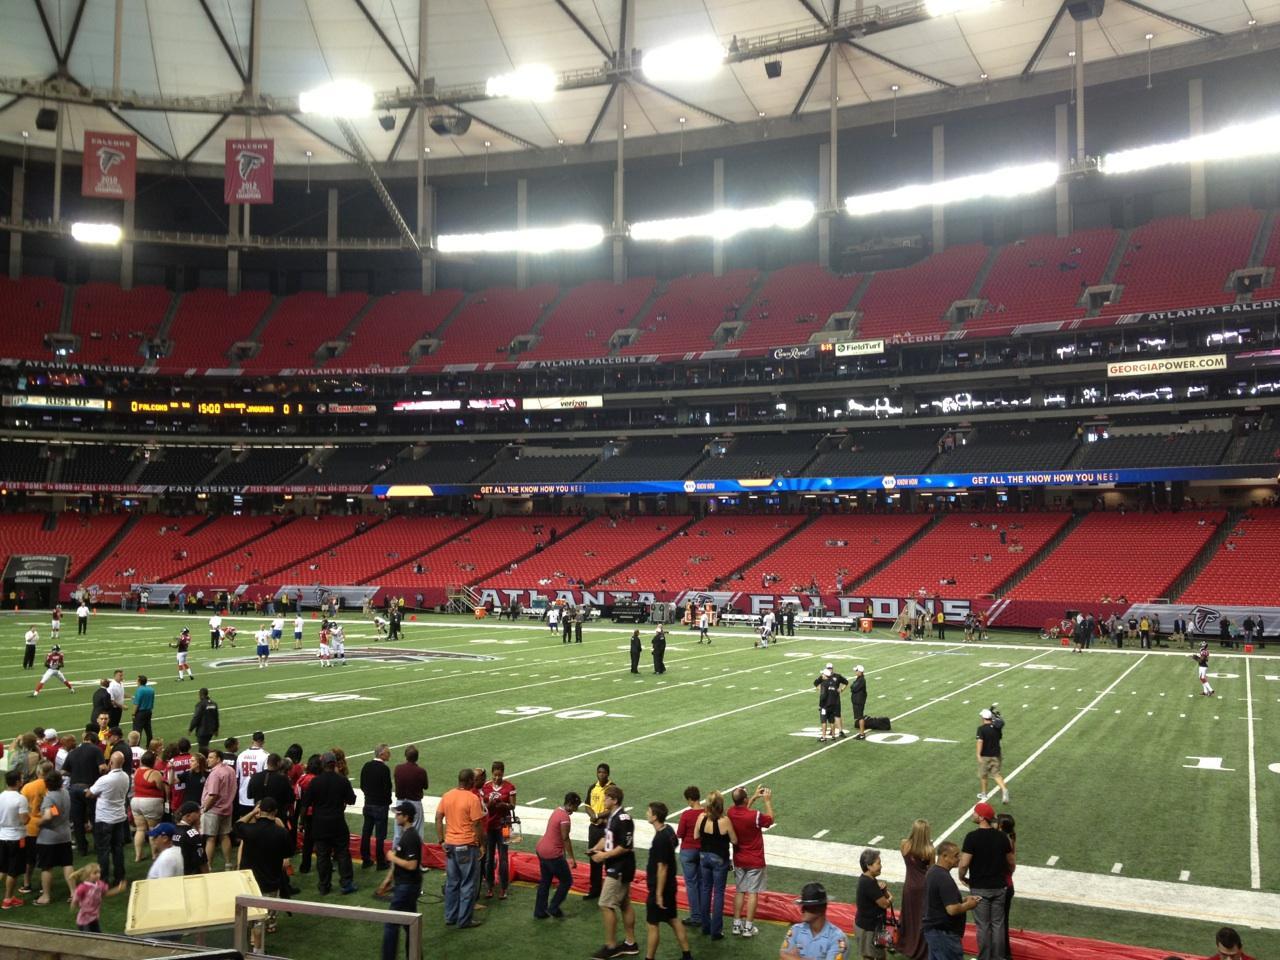 Georgia Dome Section 112 Row 8 Seat 8